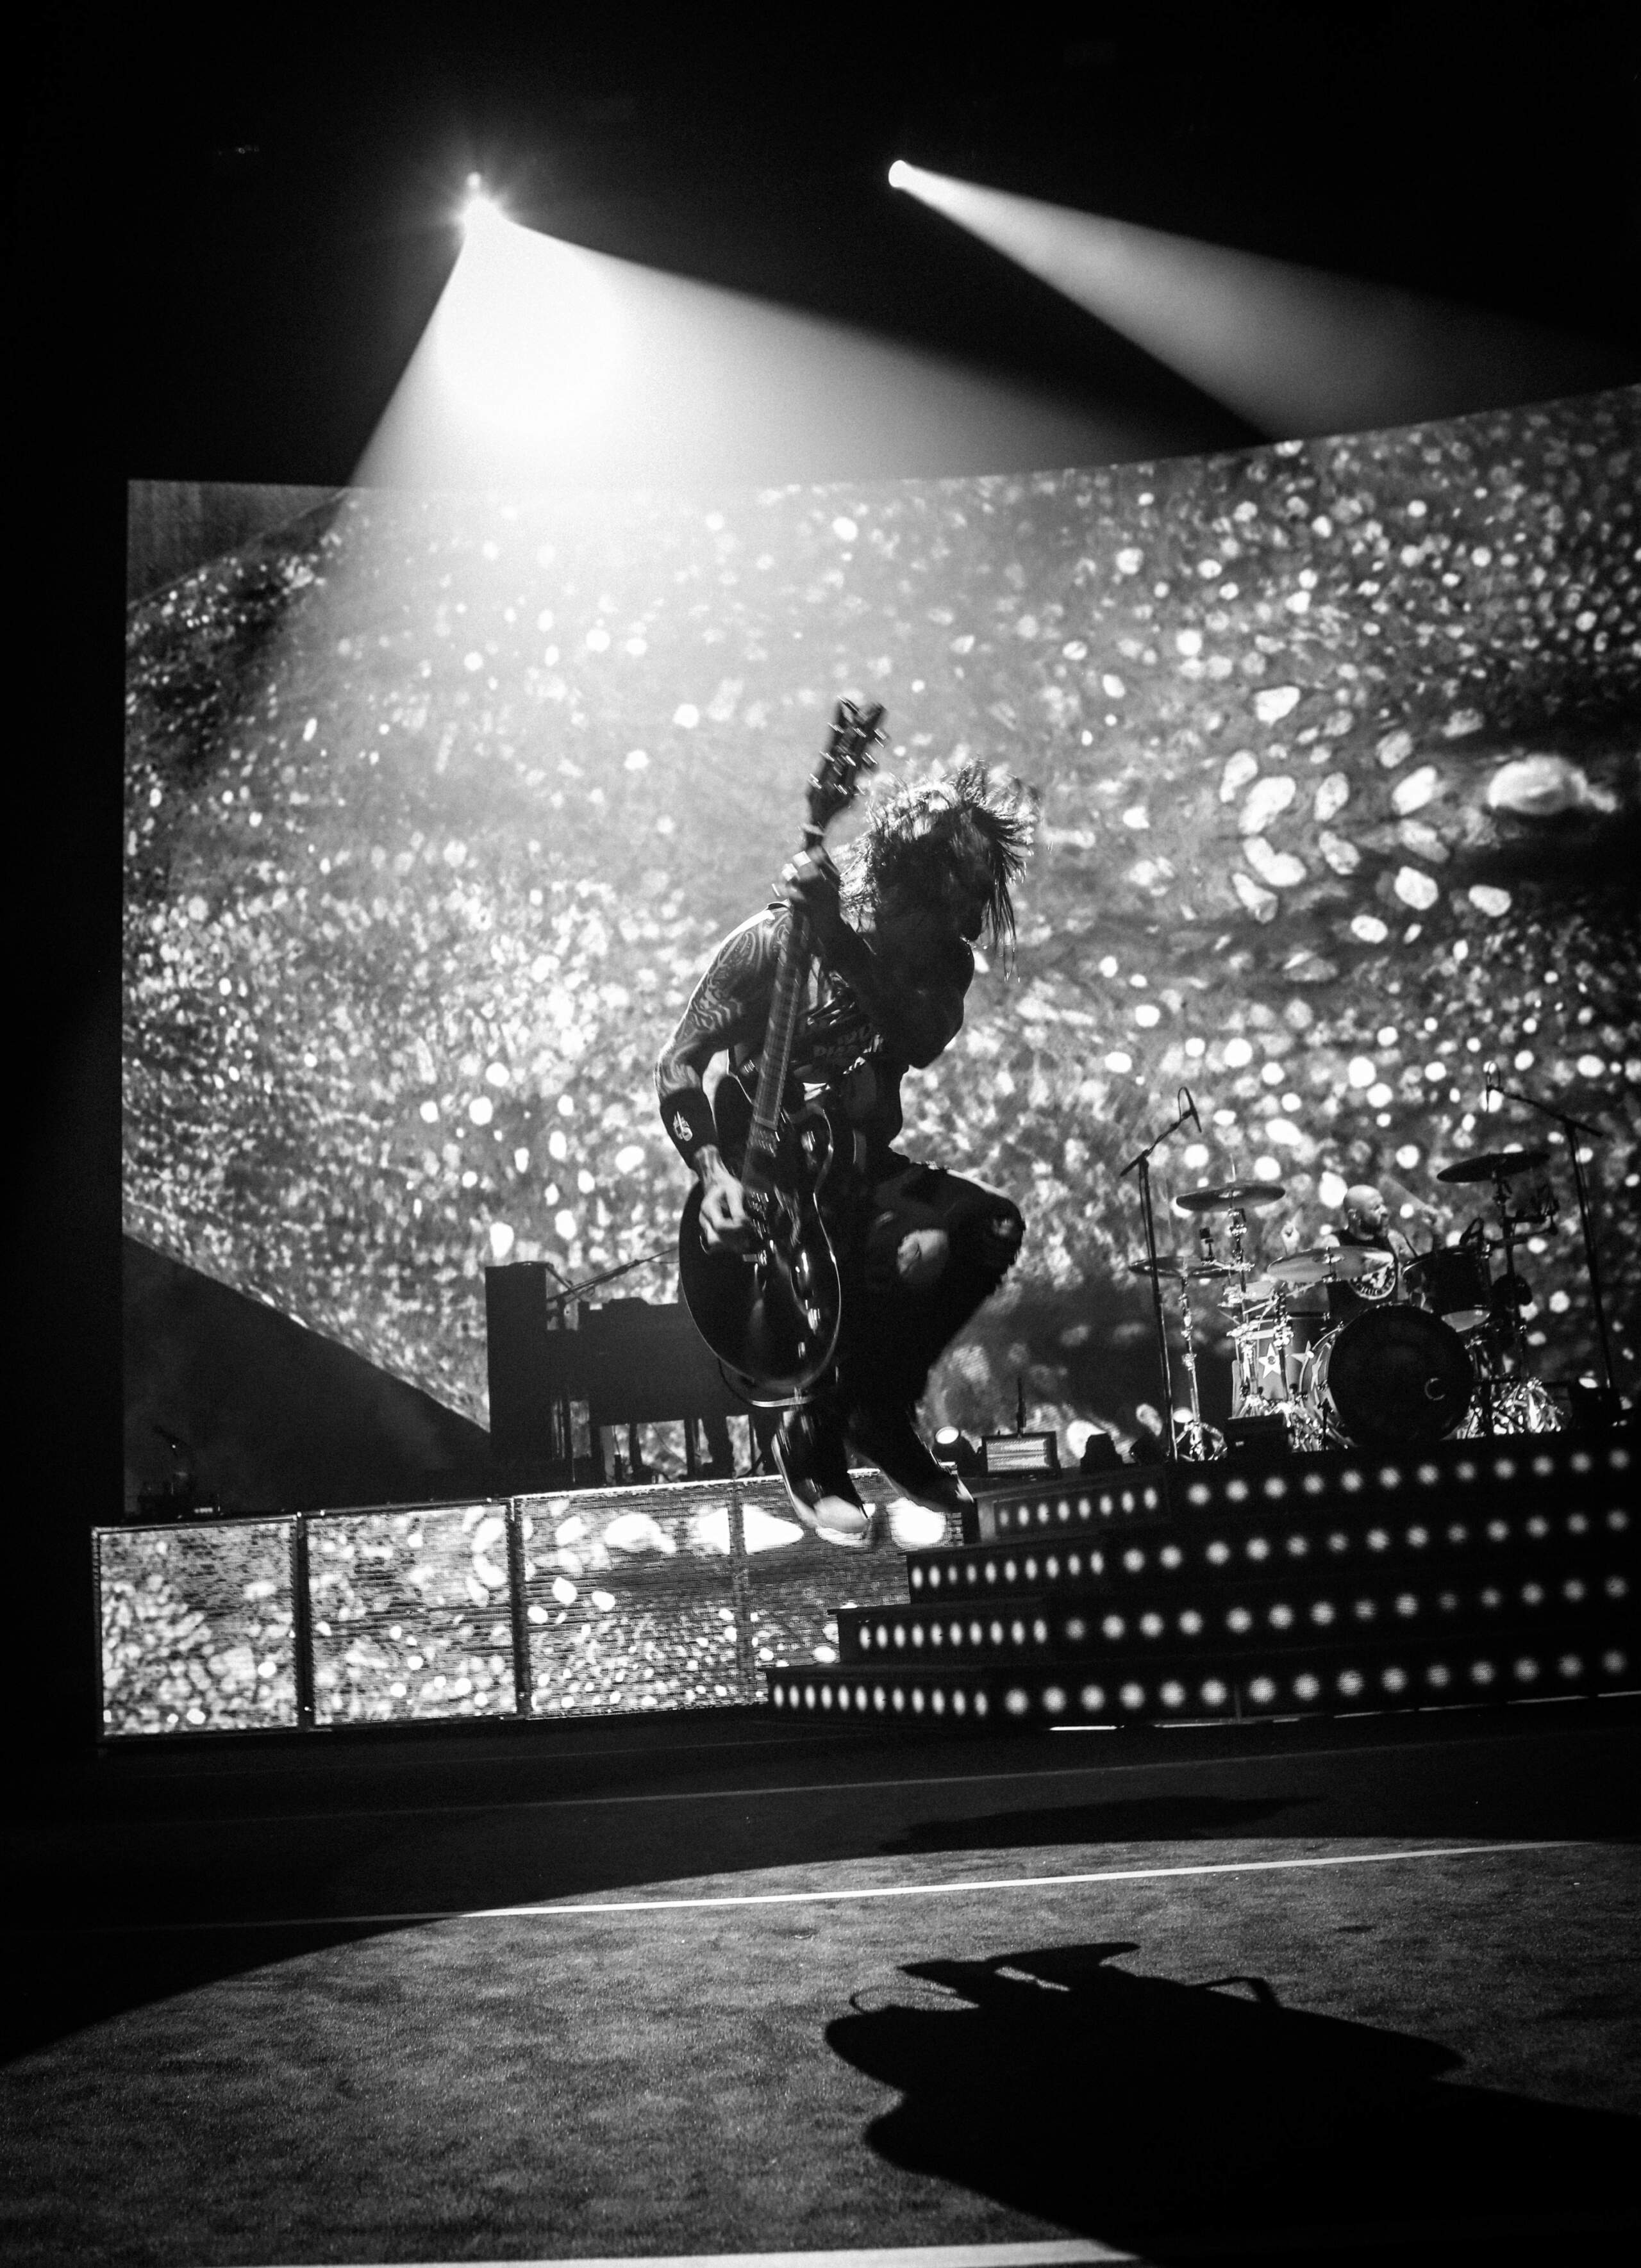 2021.10.03 - Hard Rock Live Arena, Hollywood, FL, USA. Fbrwqk12